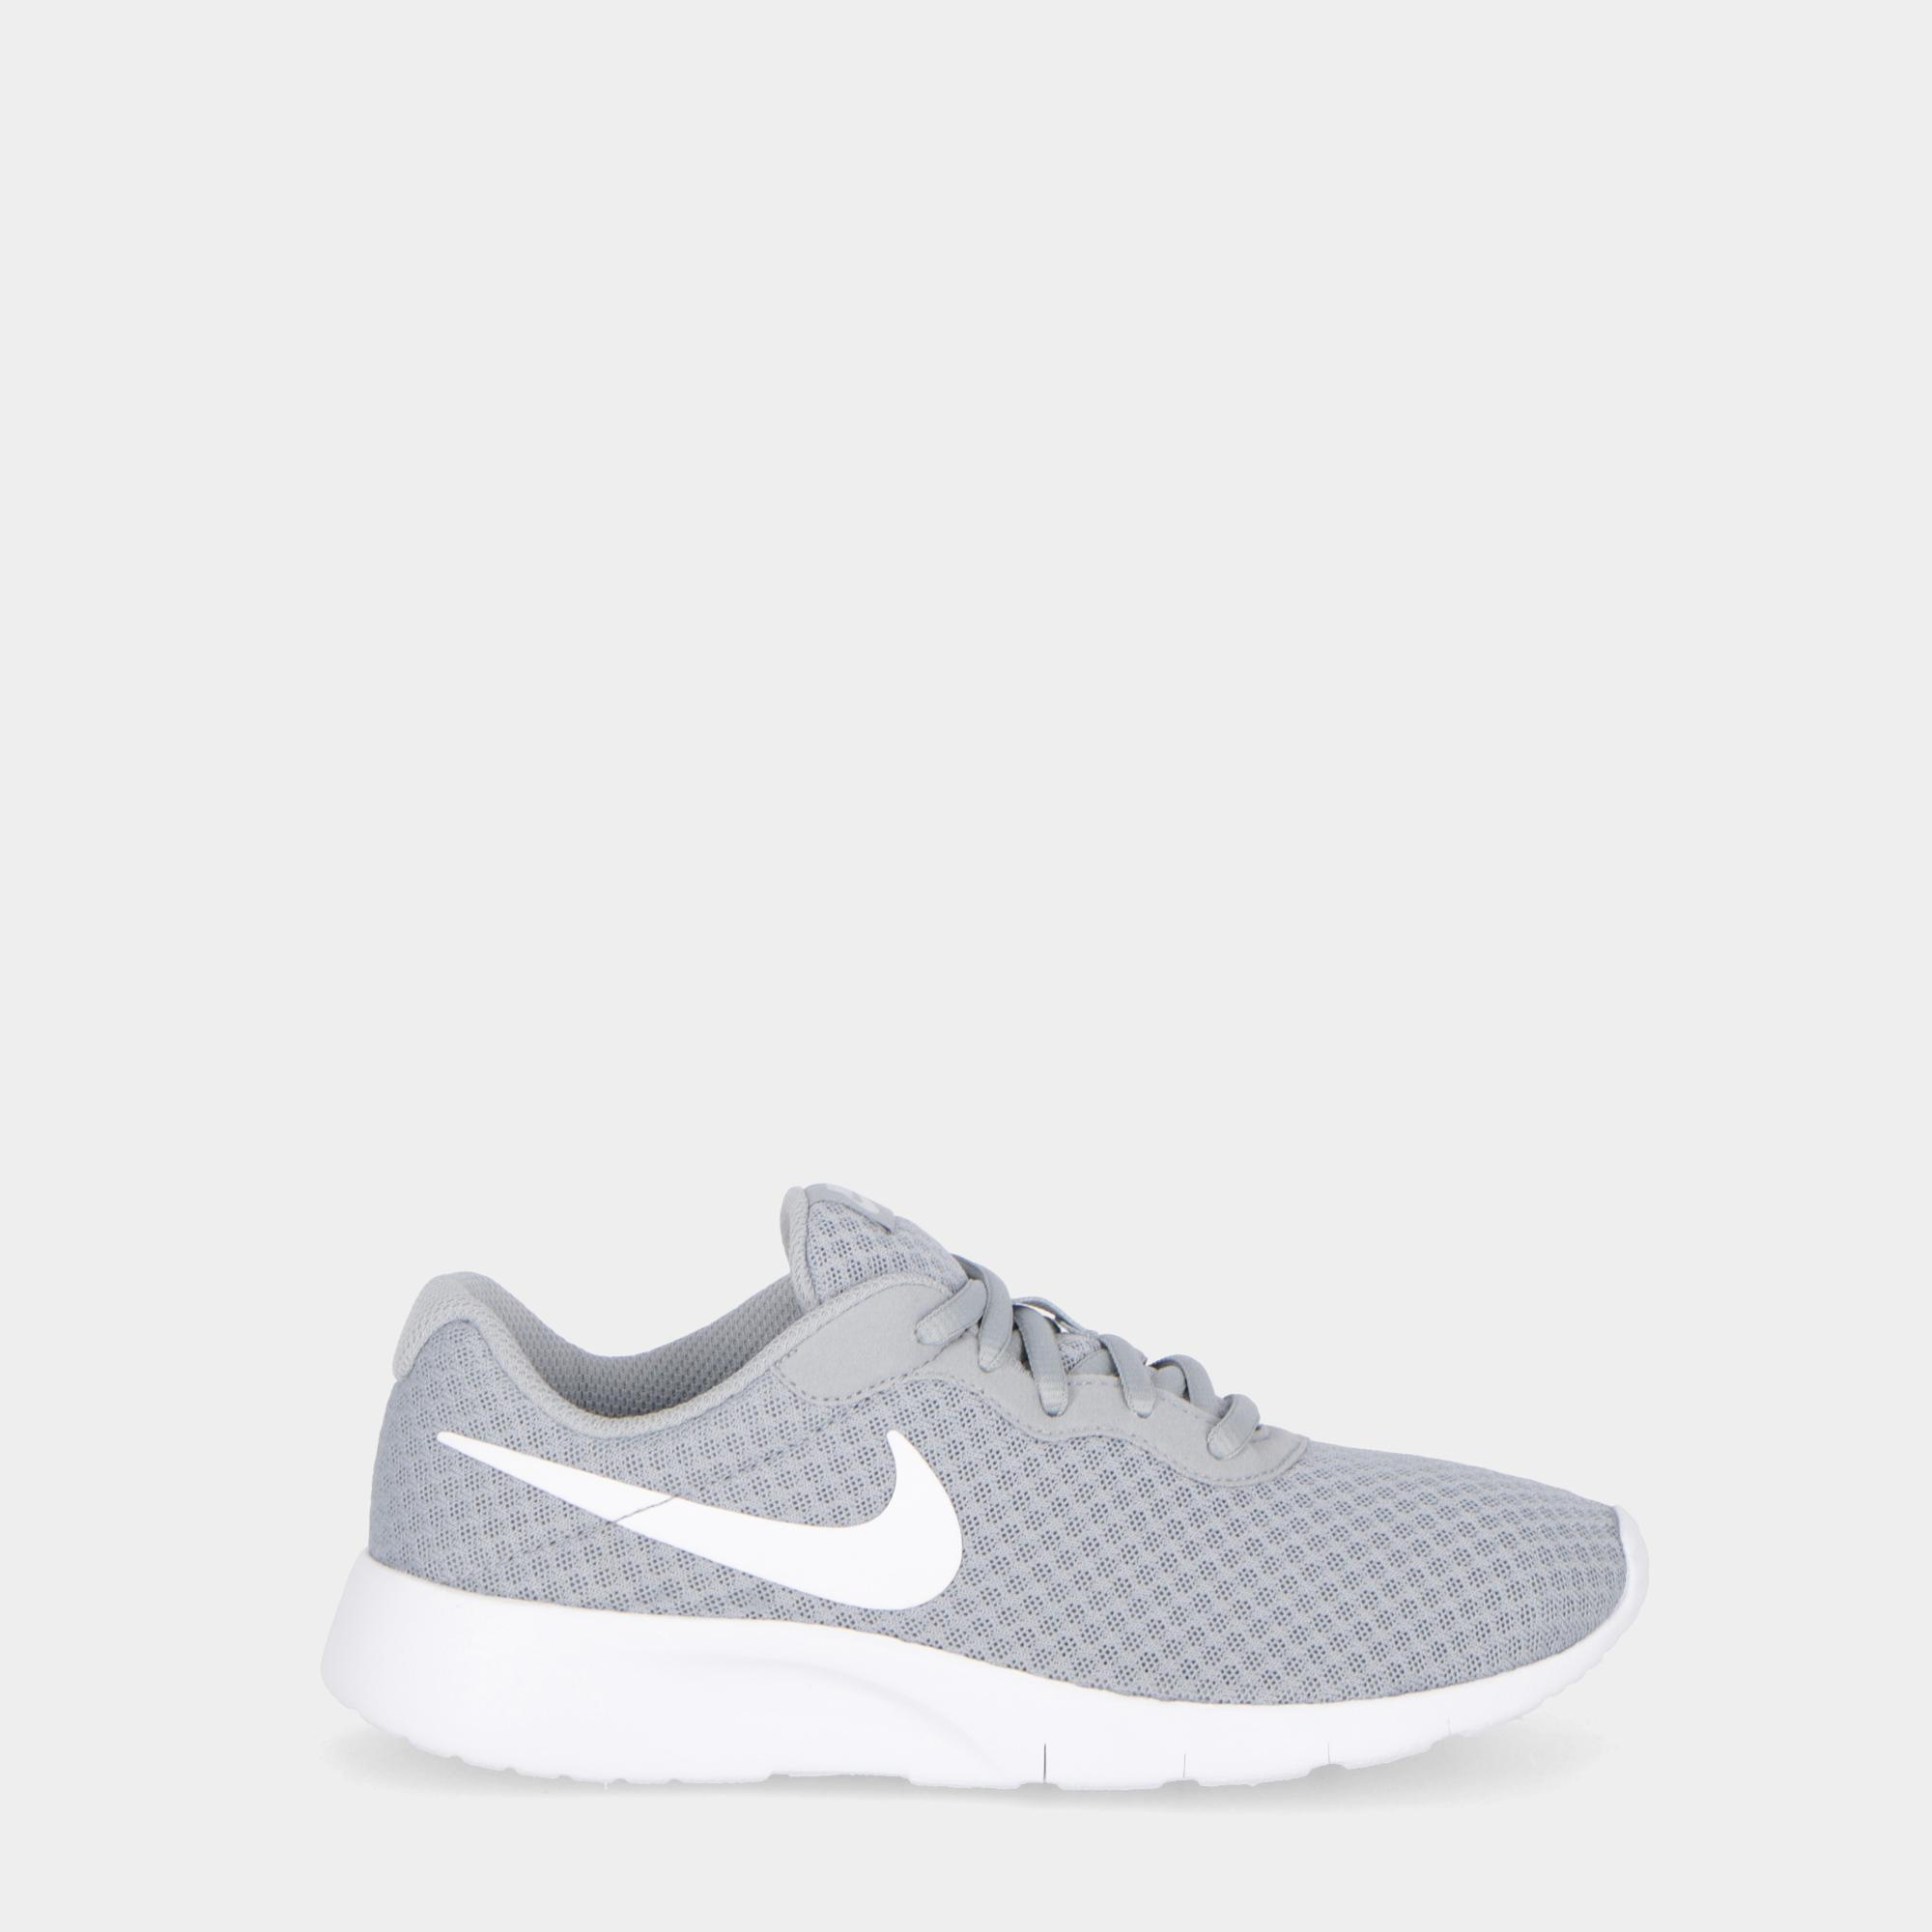 38b0476b89847 Nike Tanjun (gs) - Kids Wolf Grey White